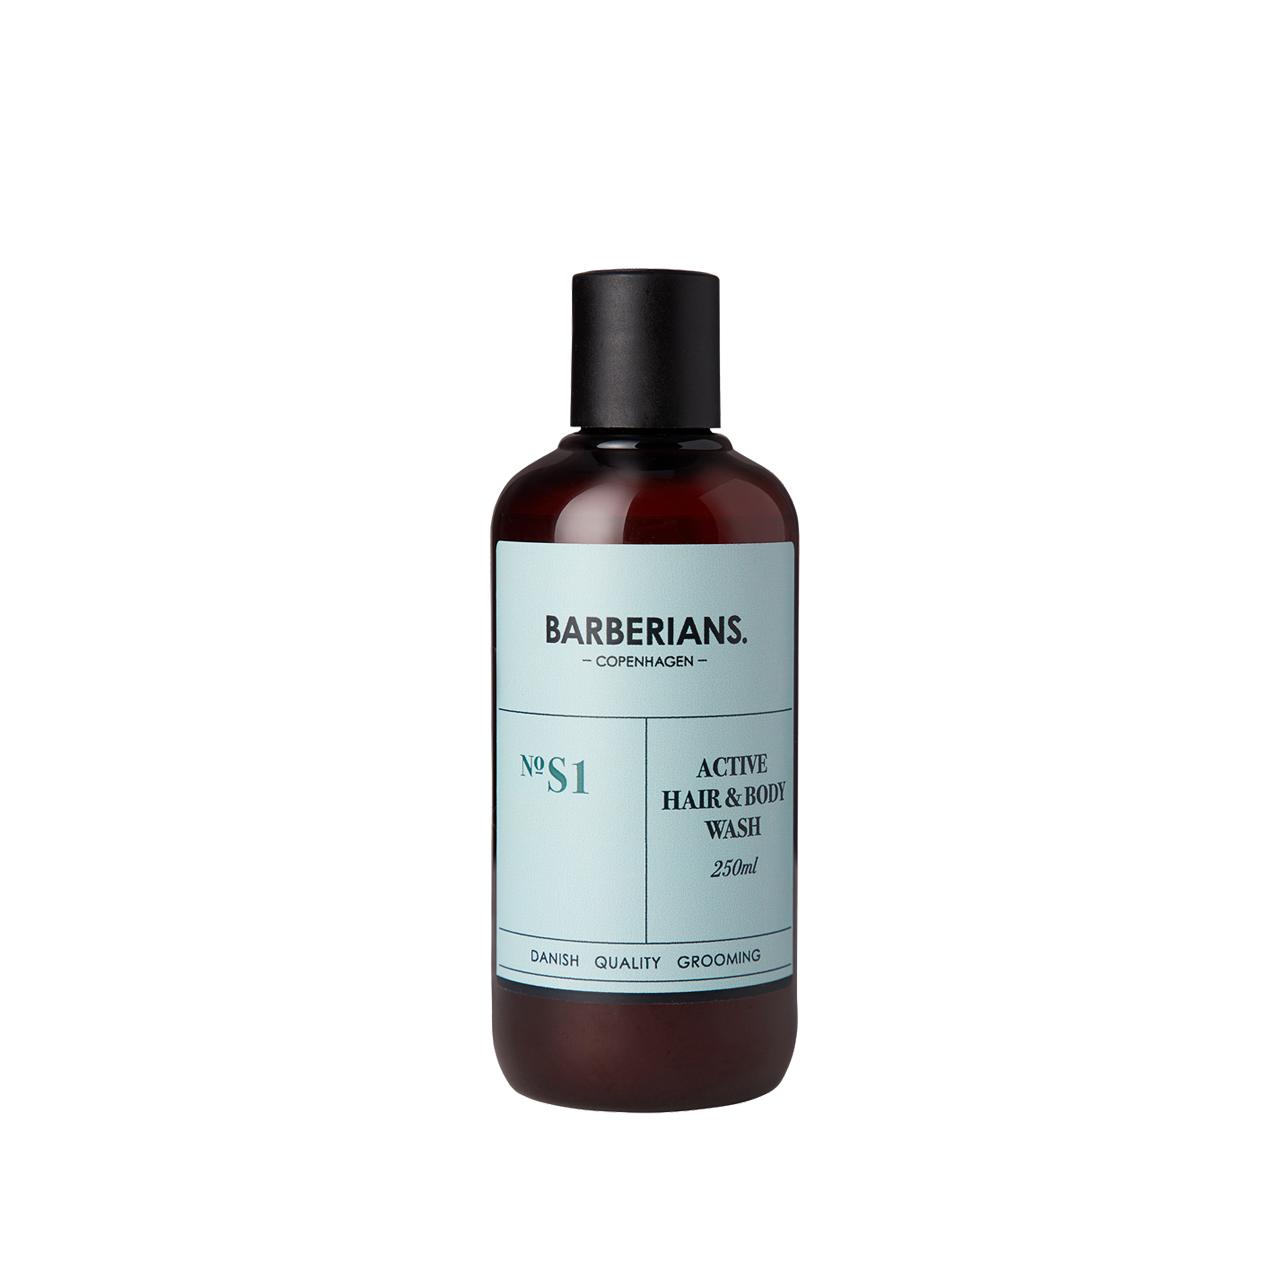 Hair & Body Wash